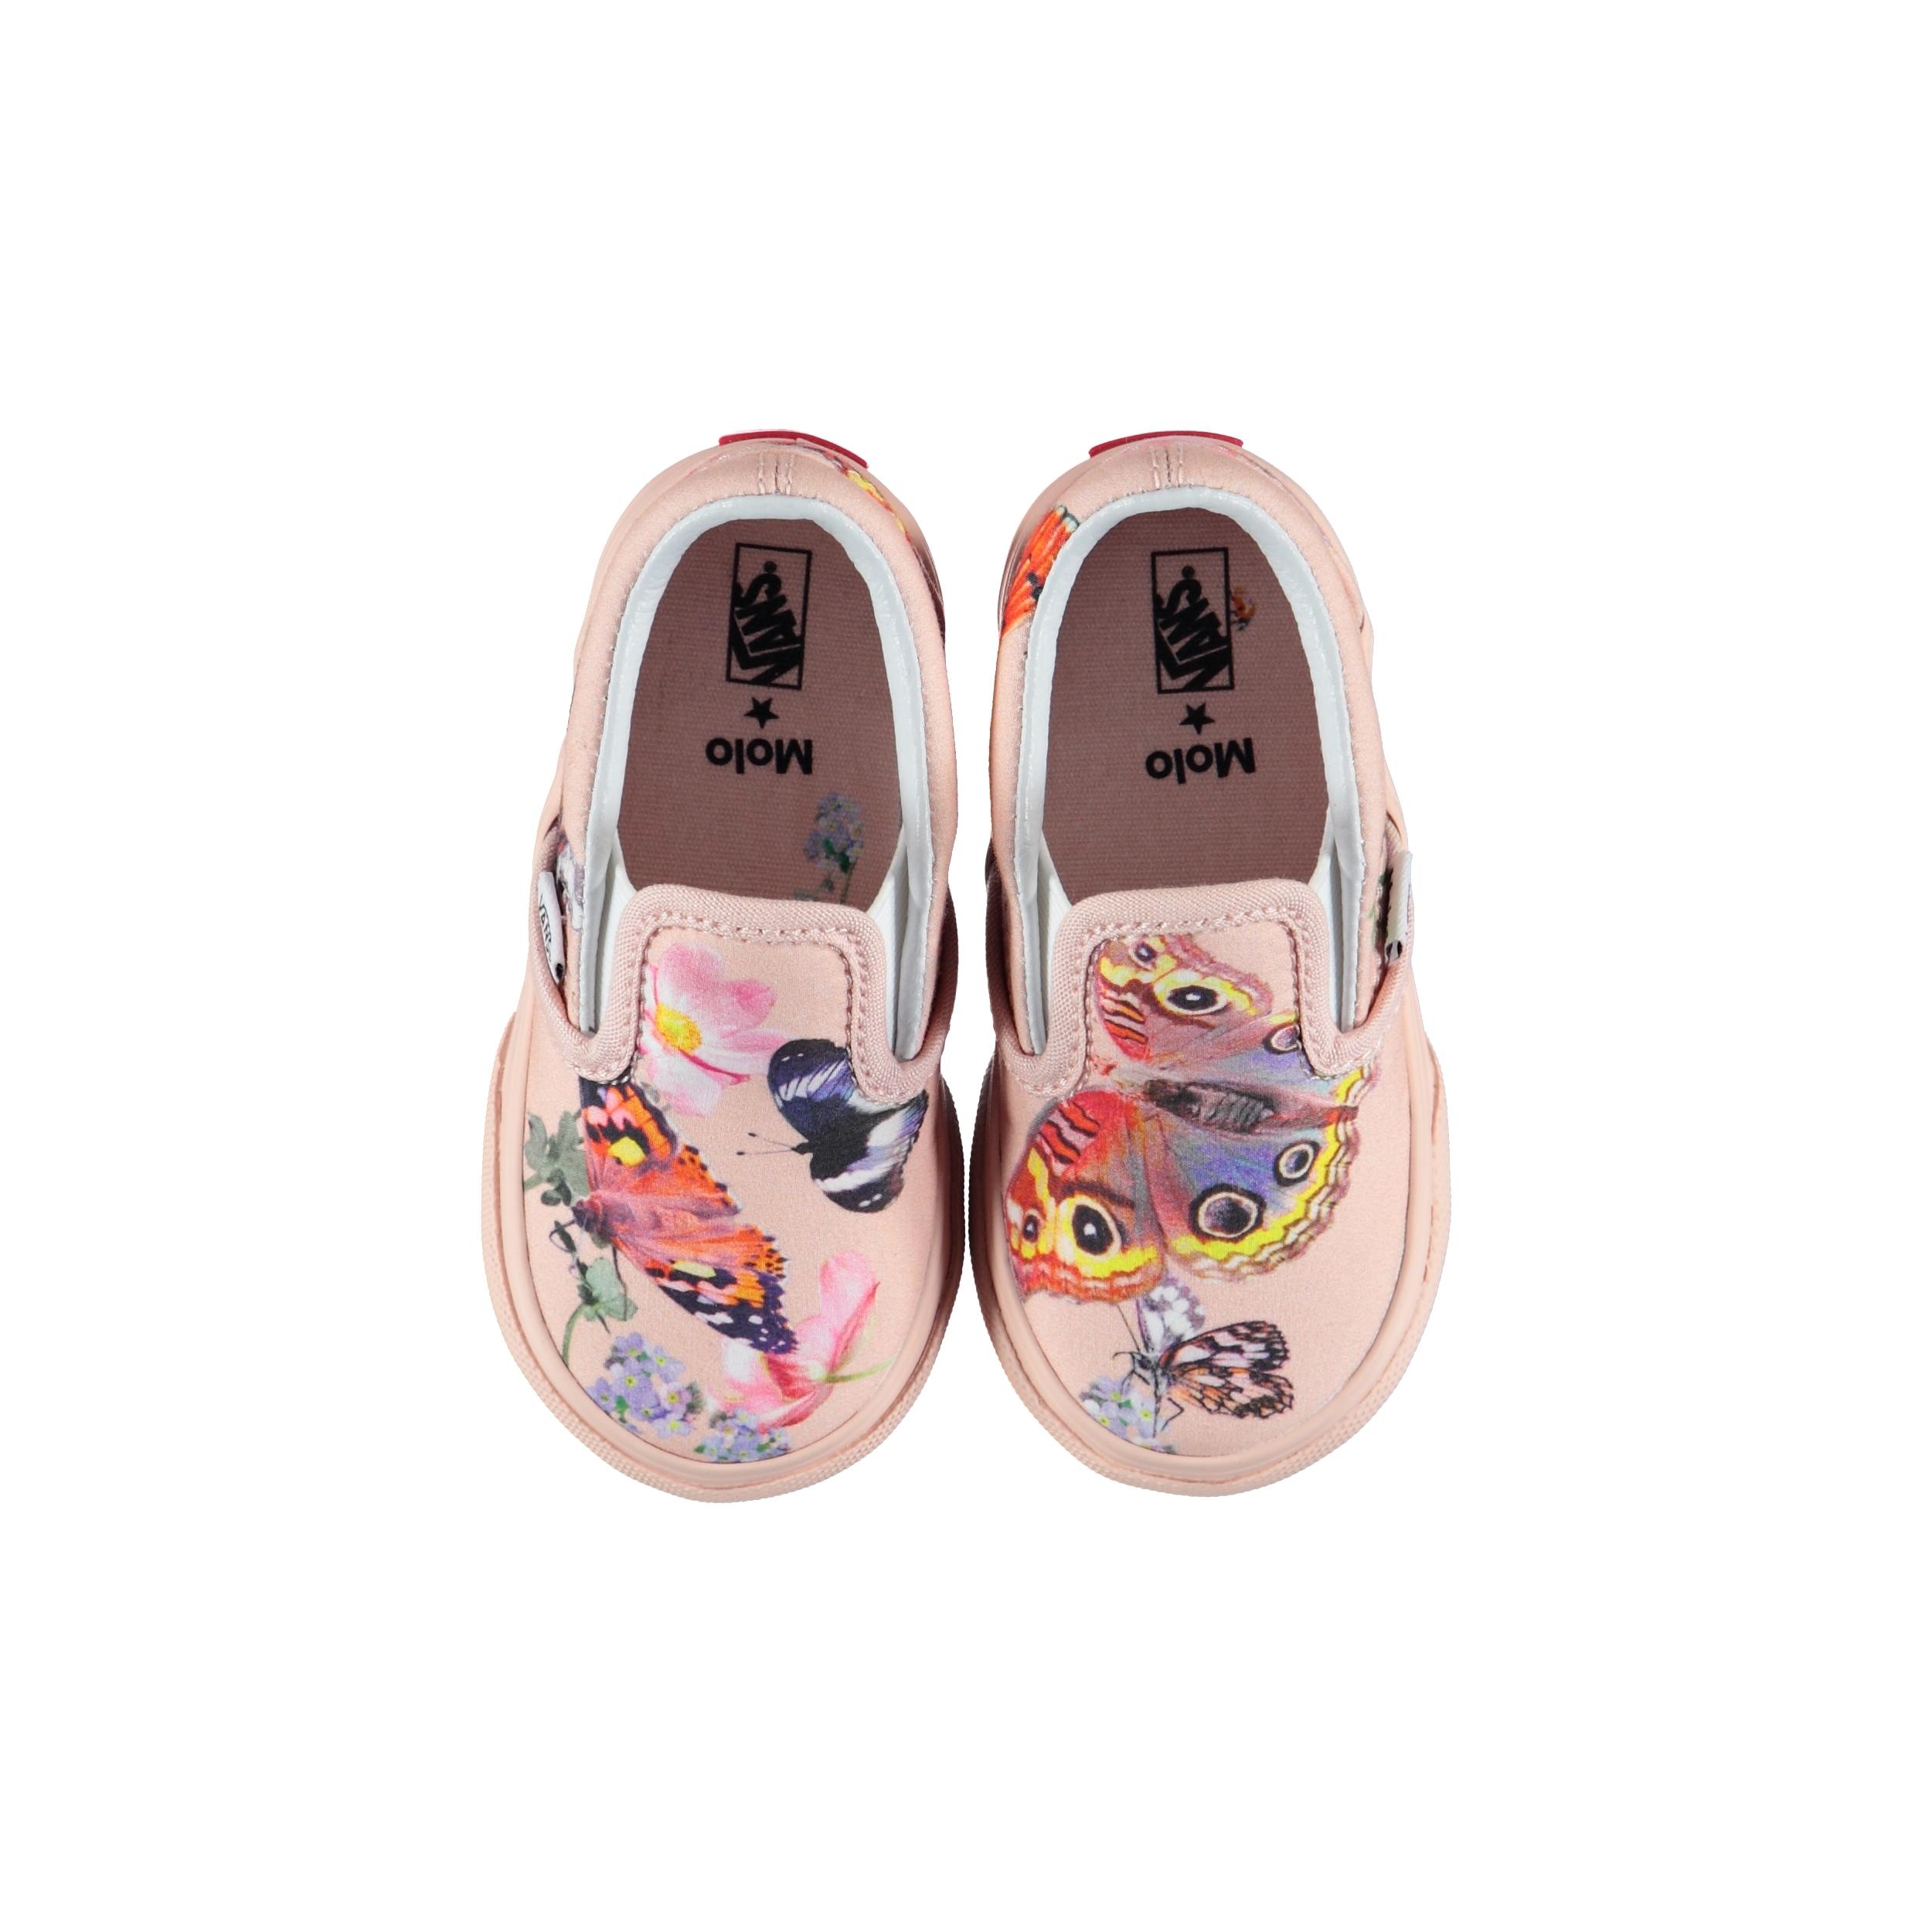 Vans x Molo 7 Toddler Slip On Pink